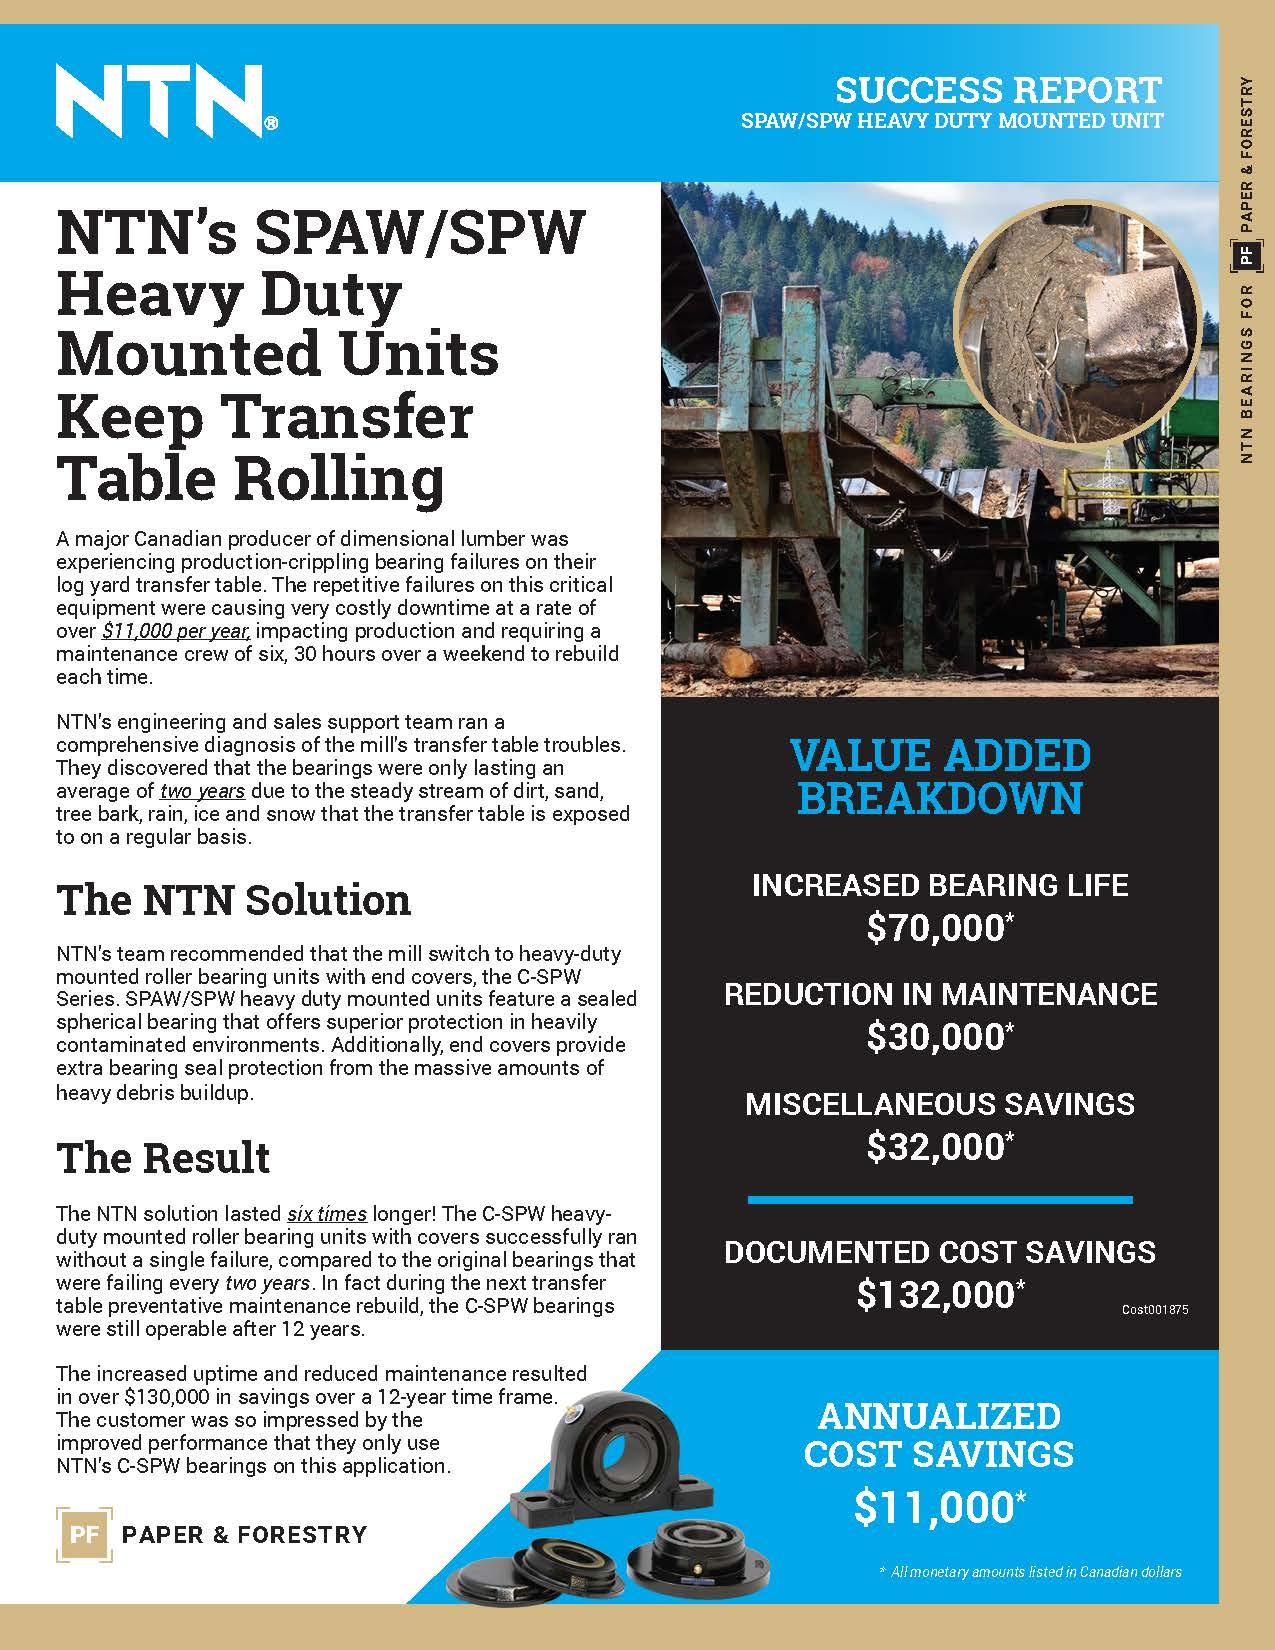 NTN SPAW/SPW heavy duty mounted bearing units transfer table